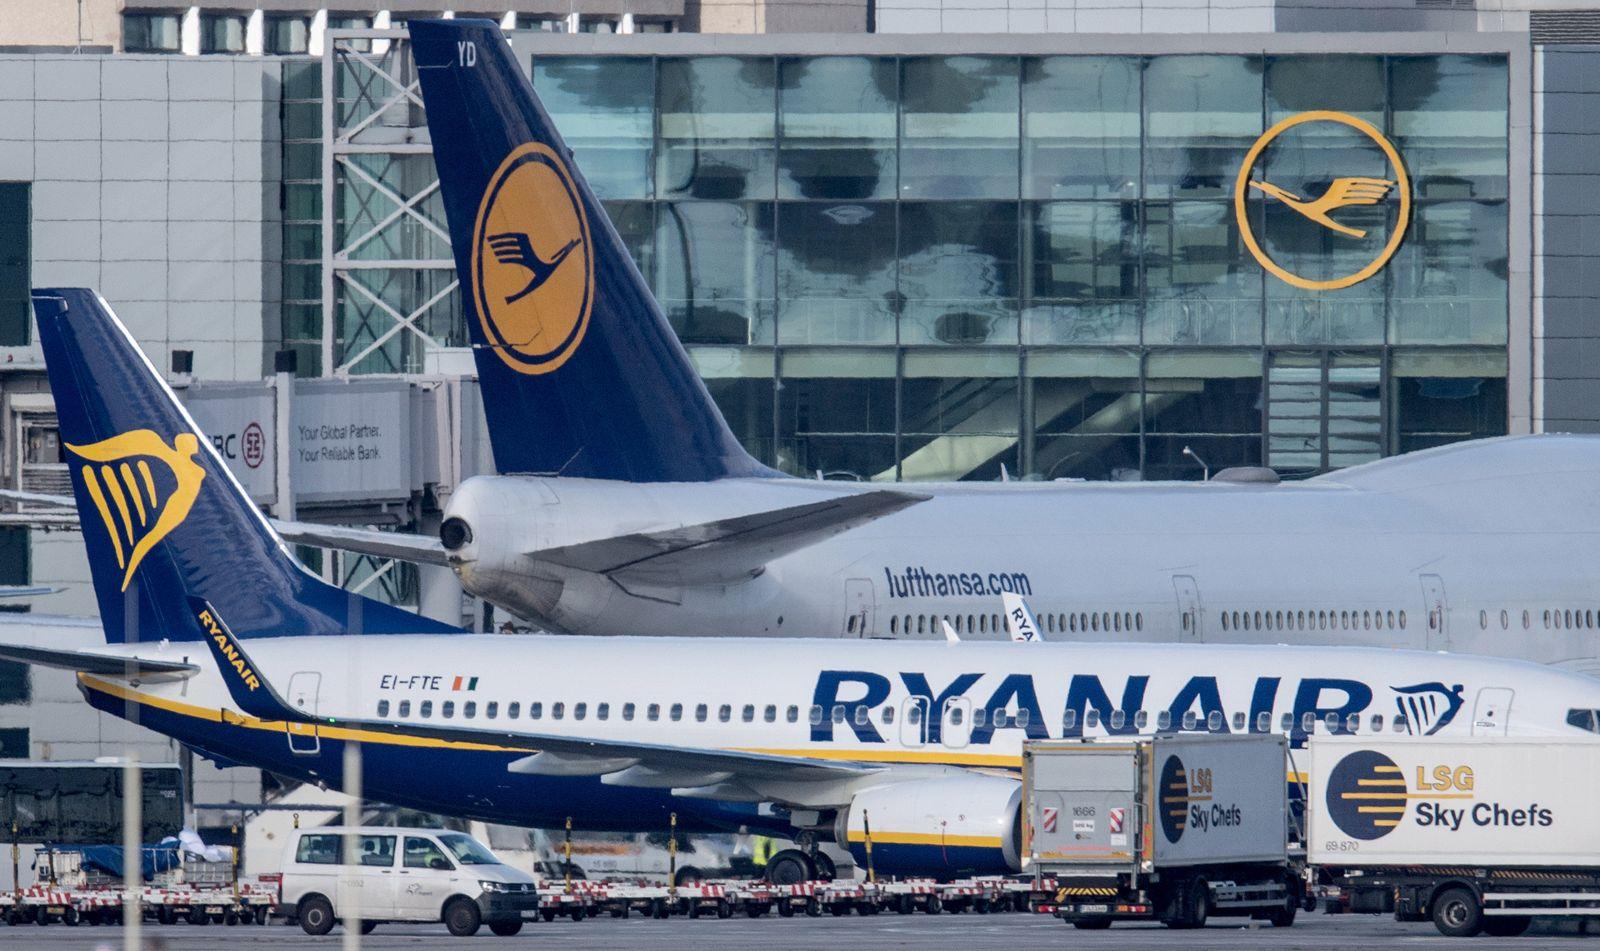 Lufthansa / Ryanair